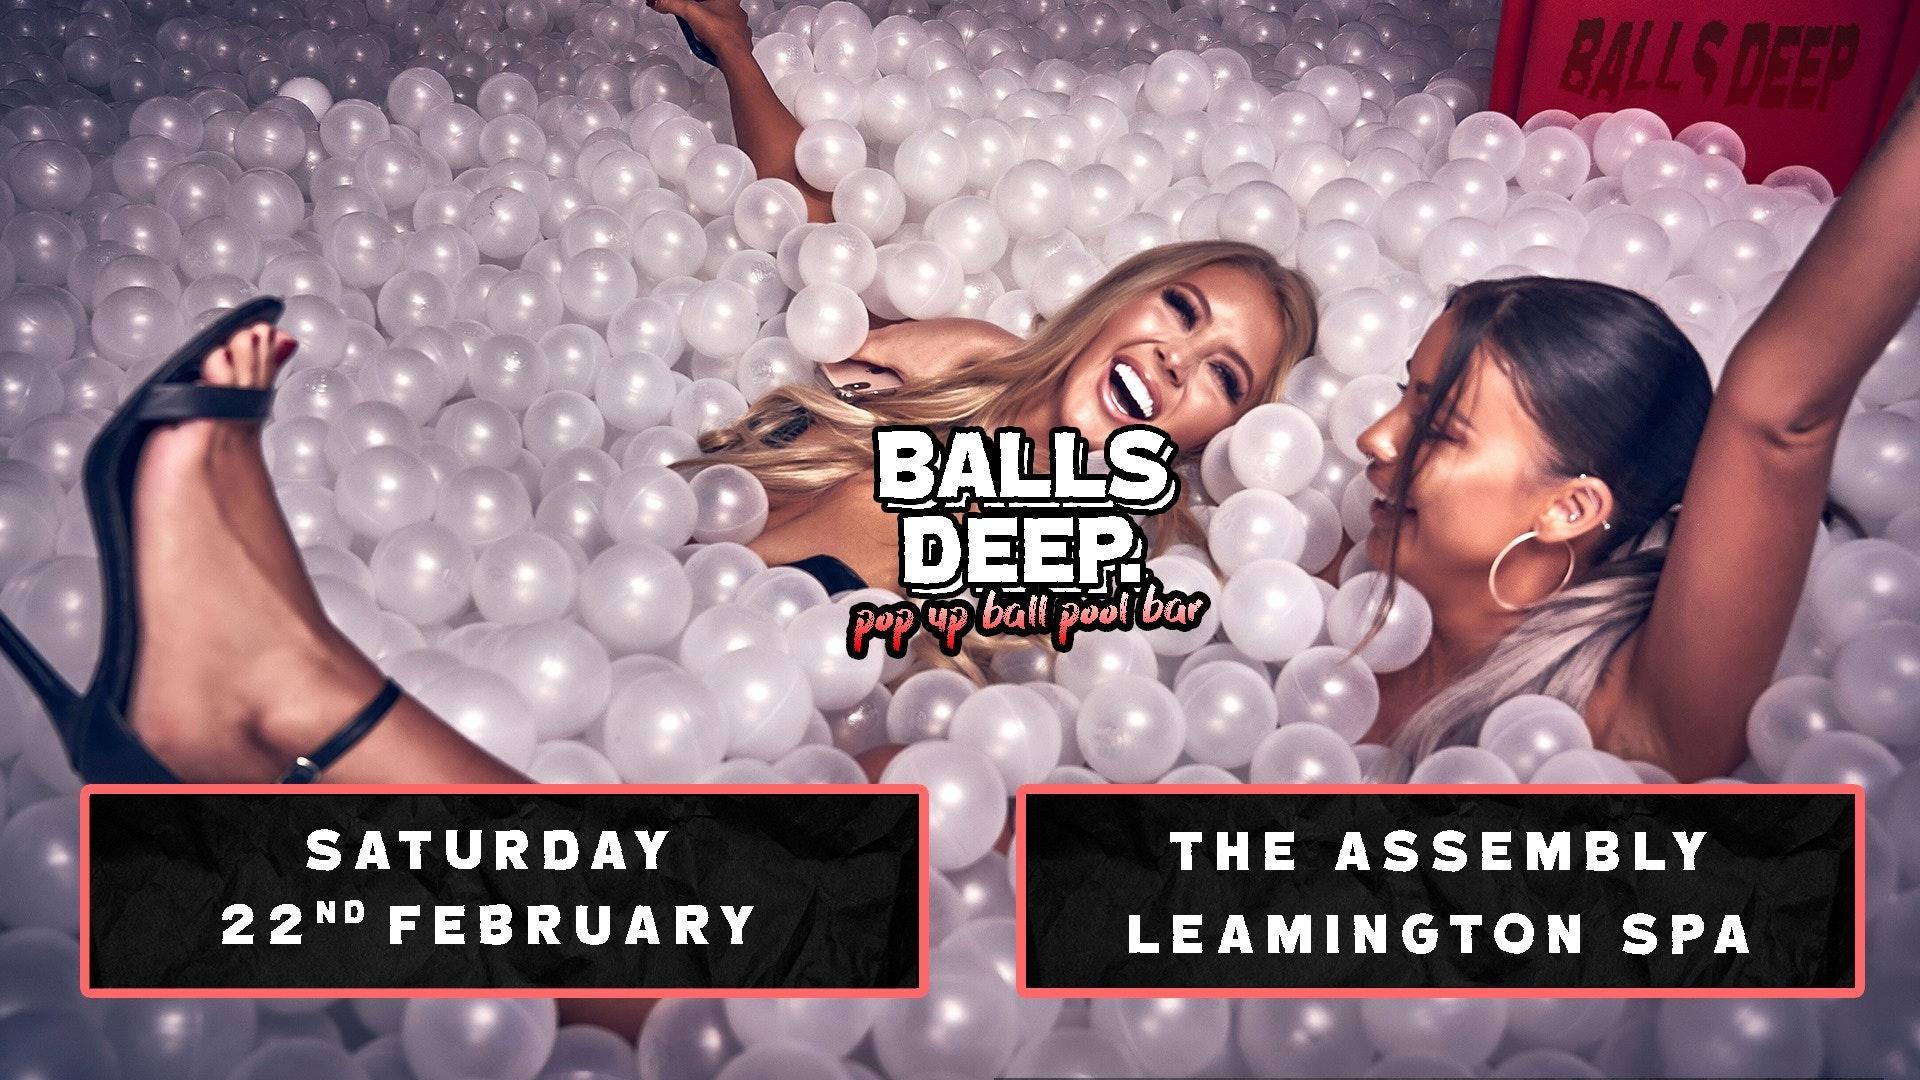 Pop Up Ball-Pool Bar Comes to Leamington Spa!